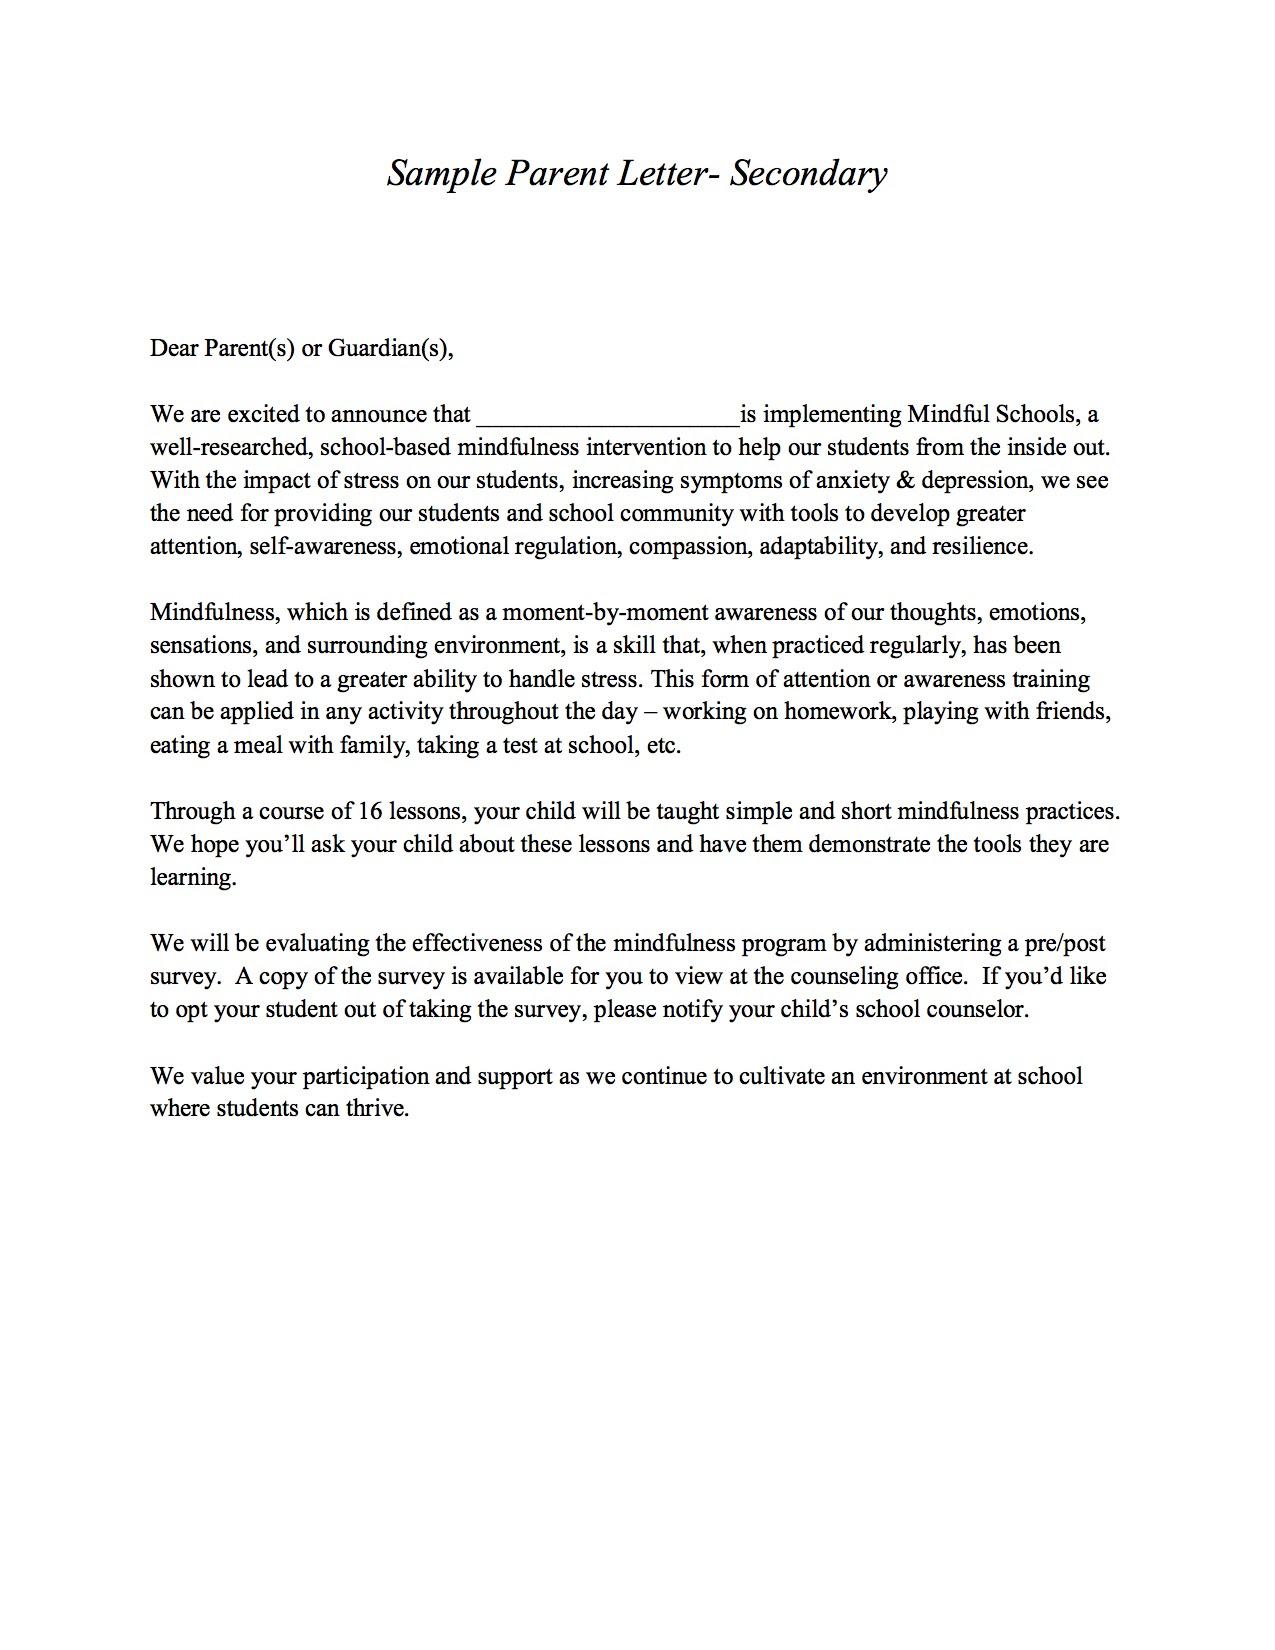 Mindfulness Program Materials | Davis Behavioral Health ...